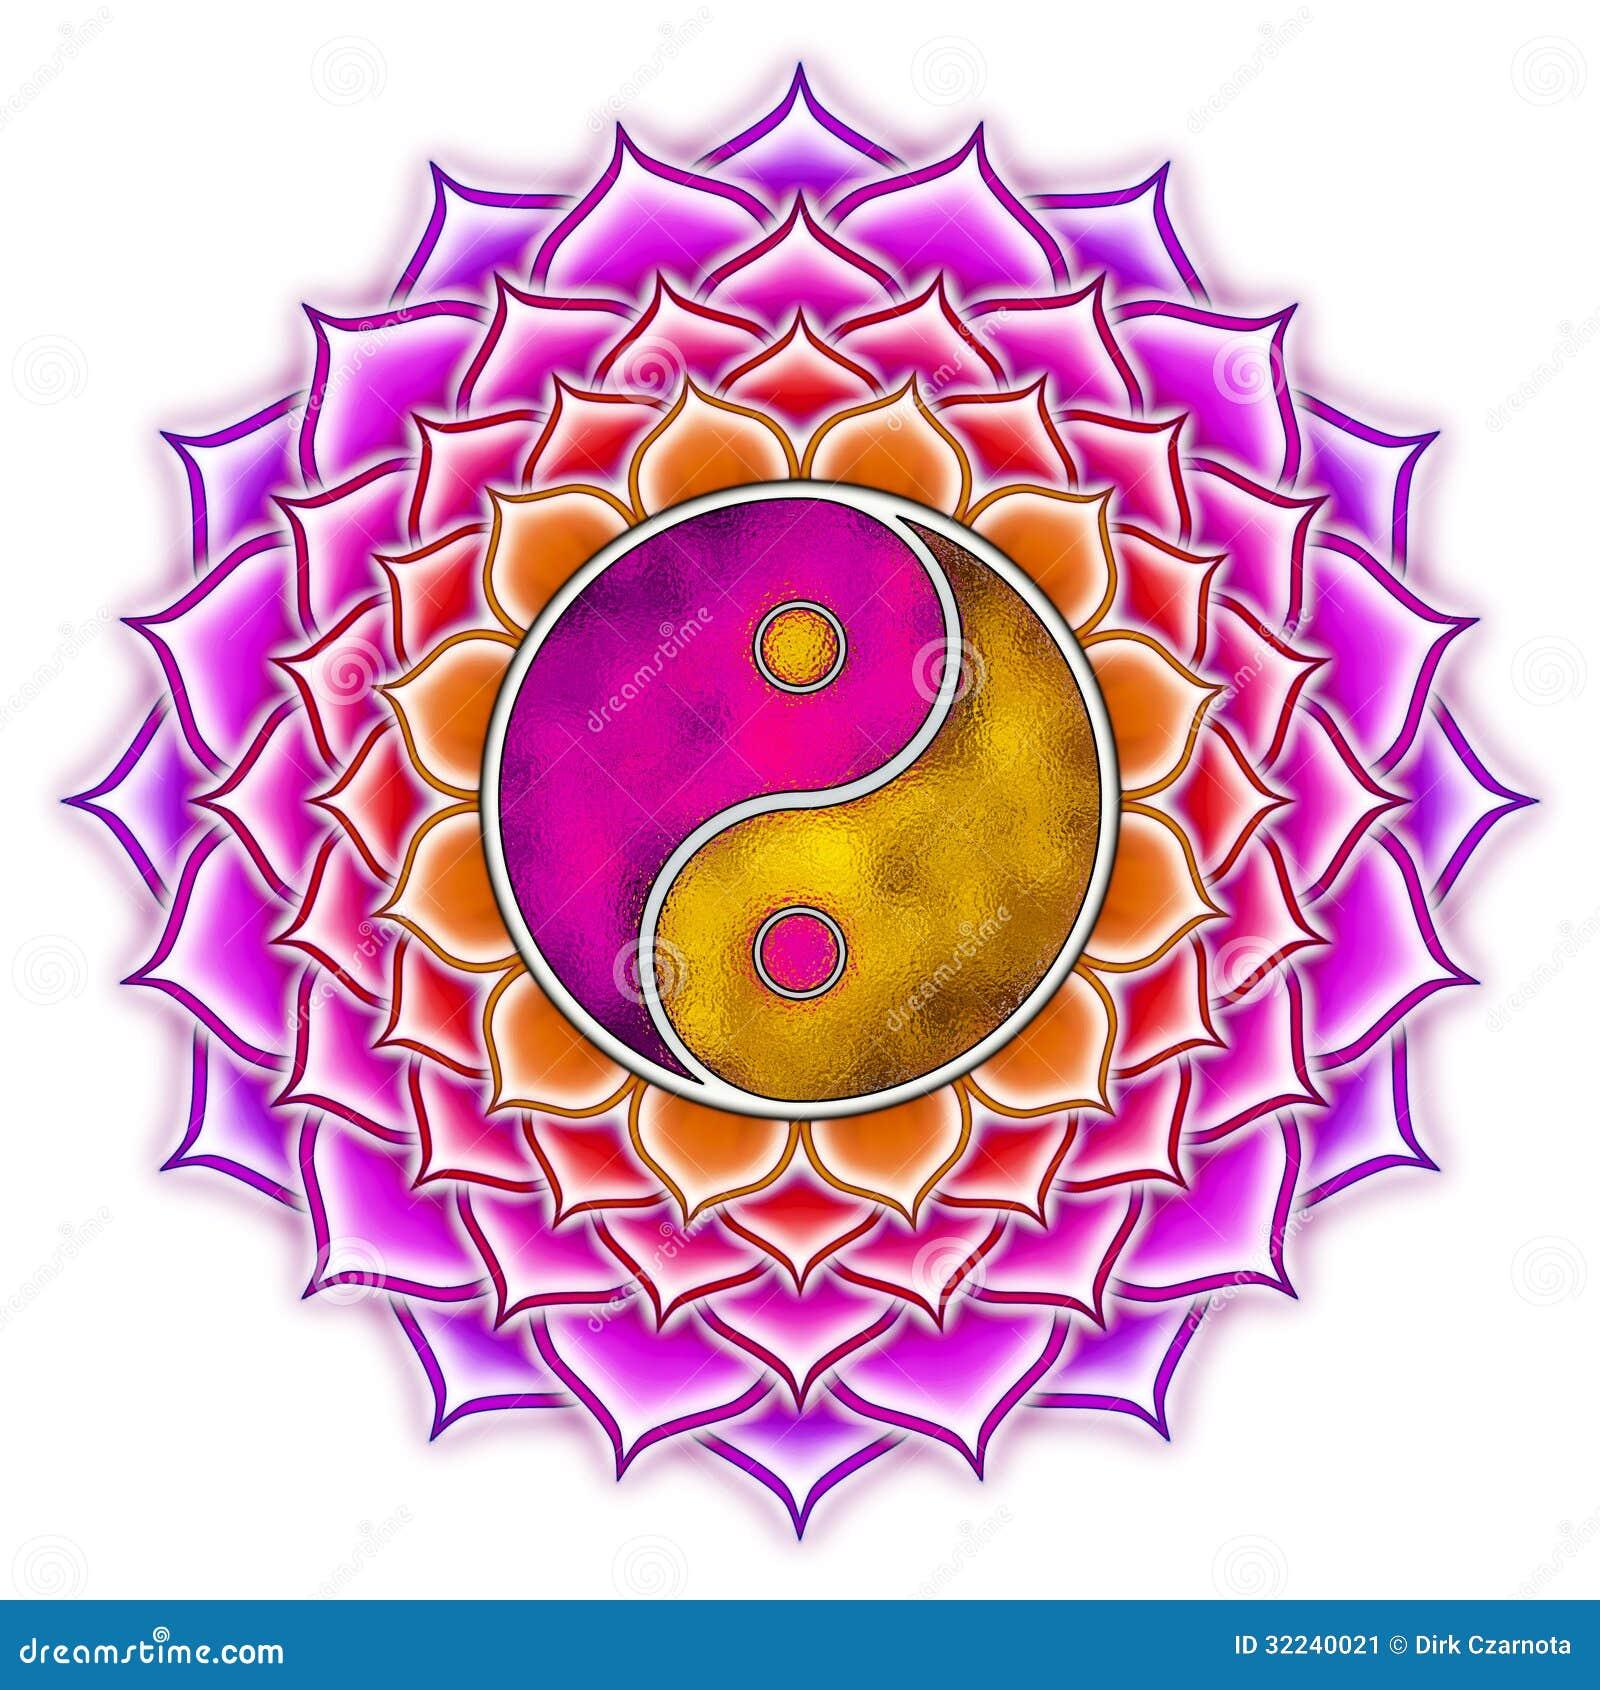 Flower Yin Yang Drawing Hairstyle